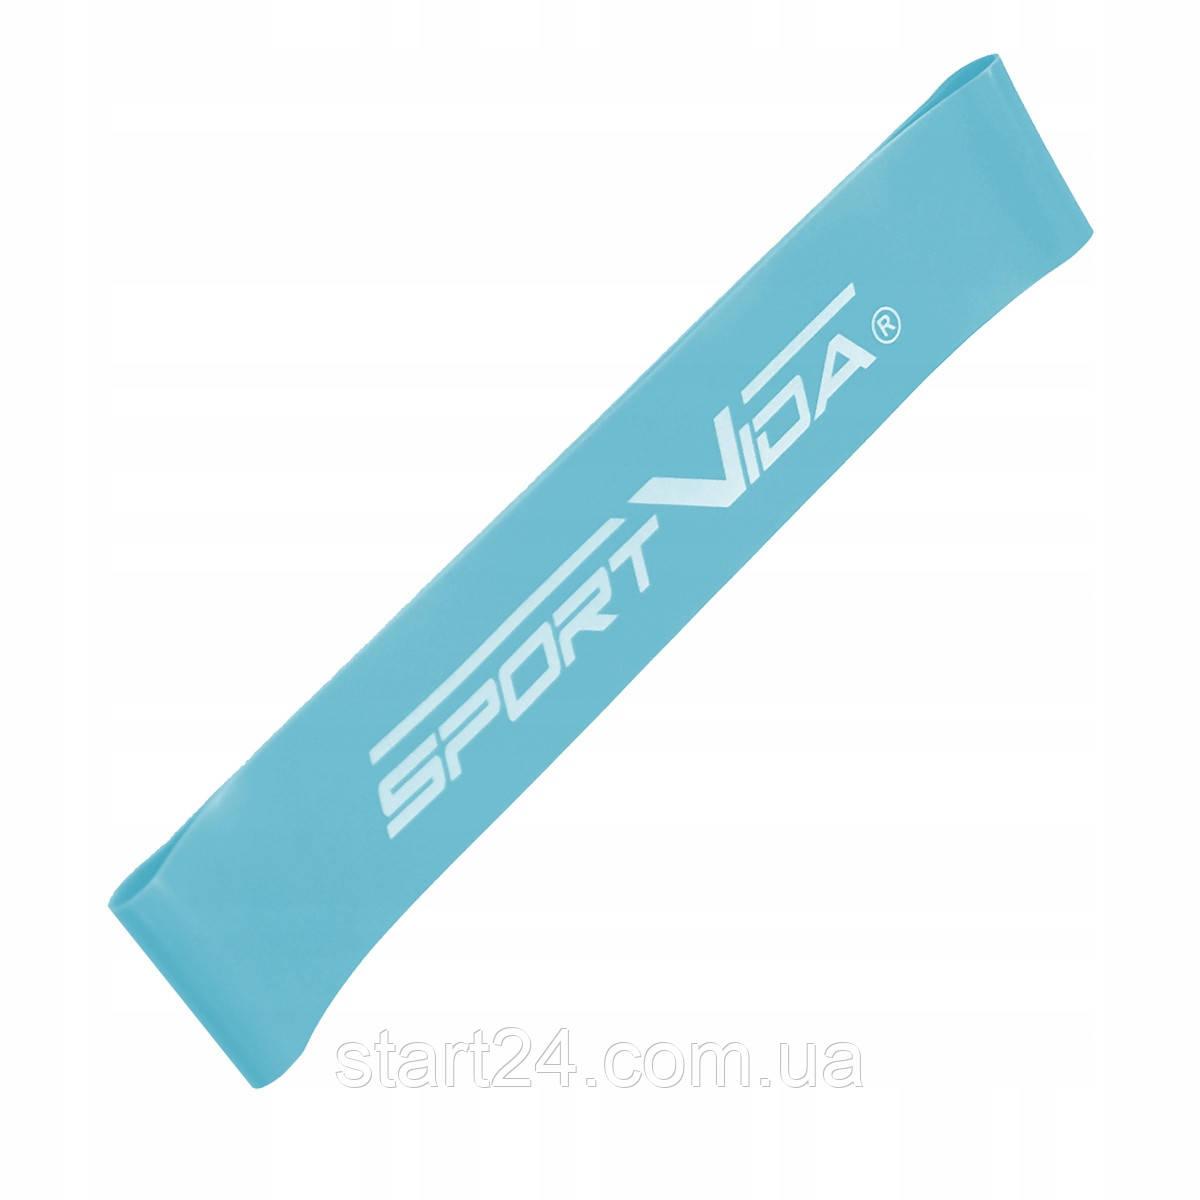 Резинка для фитнеса и спорта (лента-эспандер) SportVida Mini Power Band 0.6 мм 0-5 кг SV-HK0200